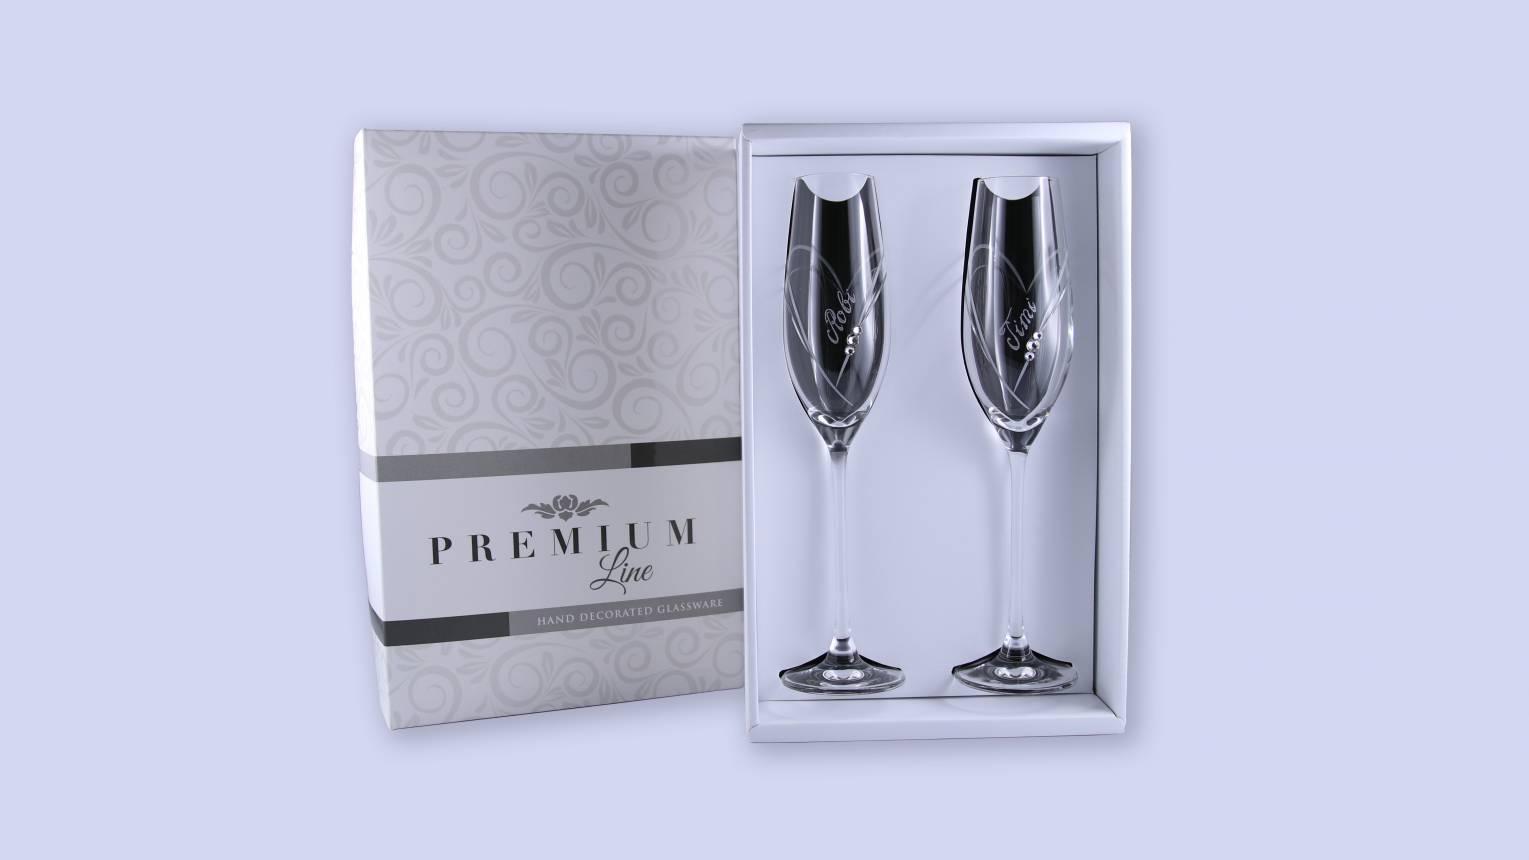 Swarovski pezsgős pohár évfordulóra